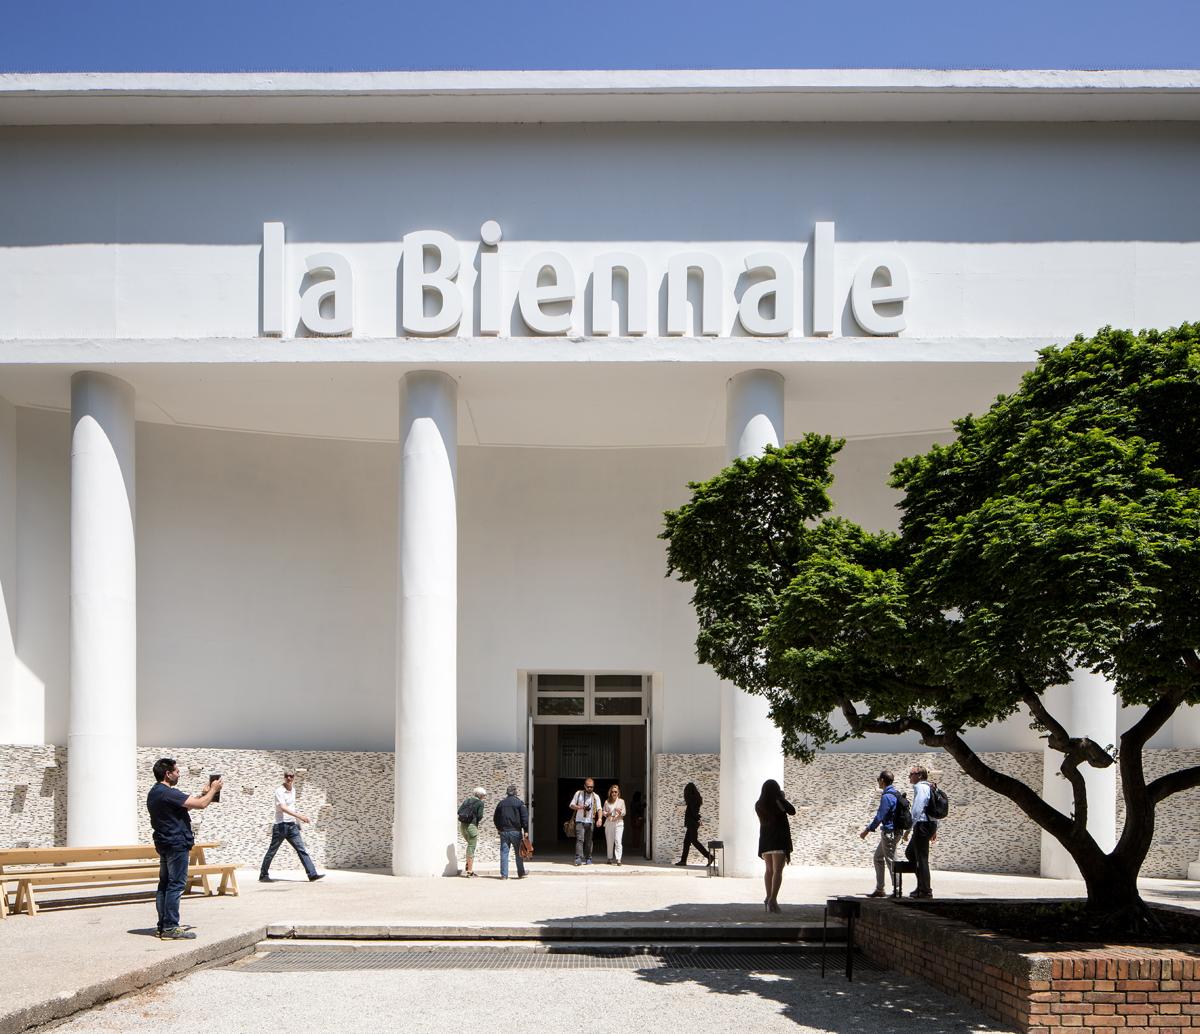 Biennale-Venezia-Padiglione-italia-Francesco-Galli